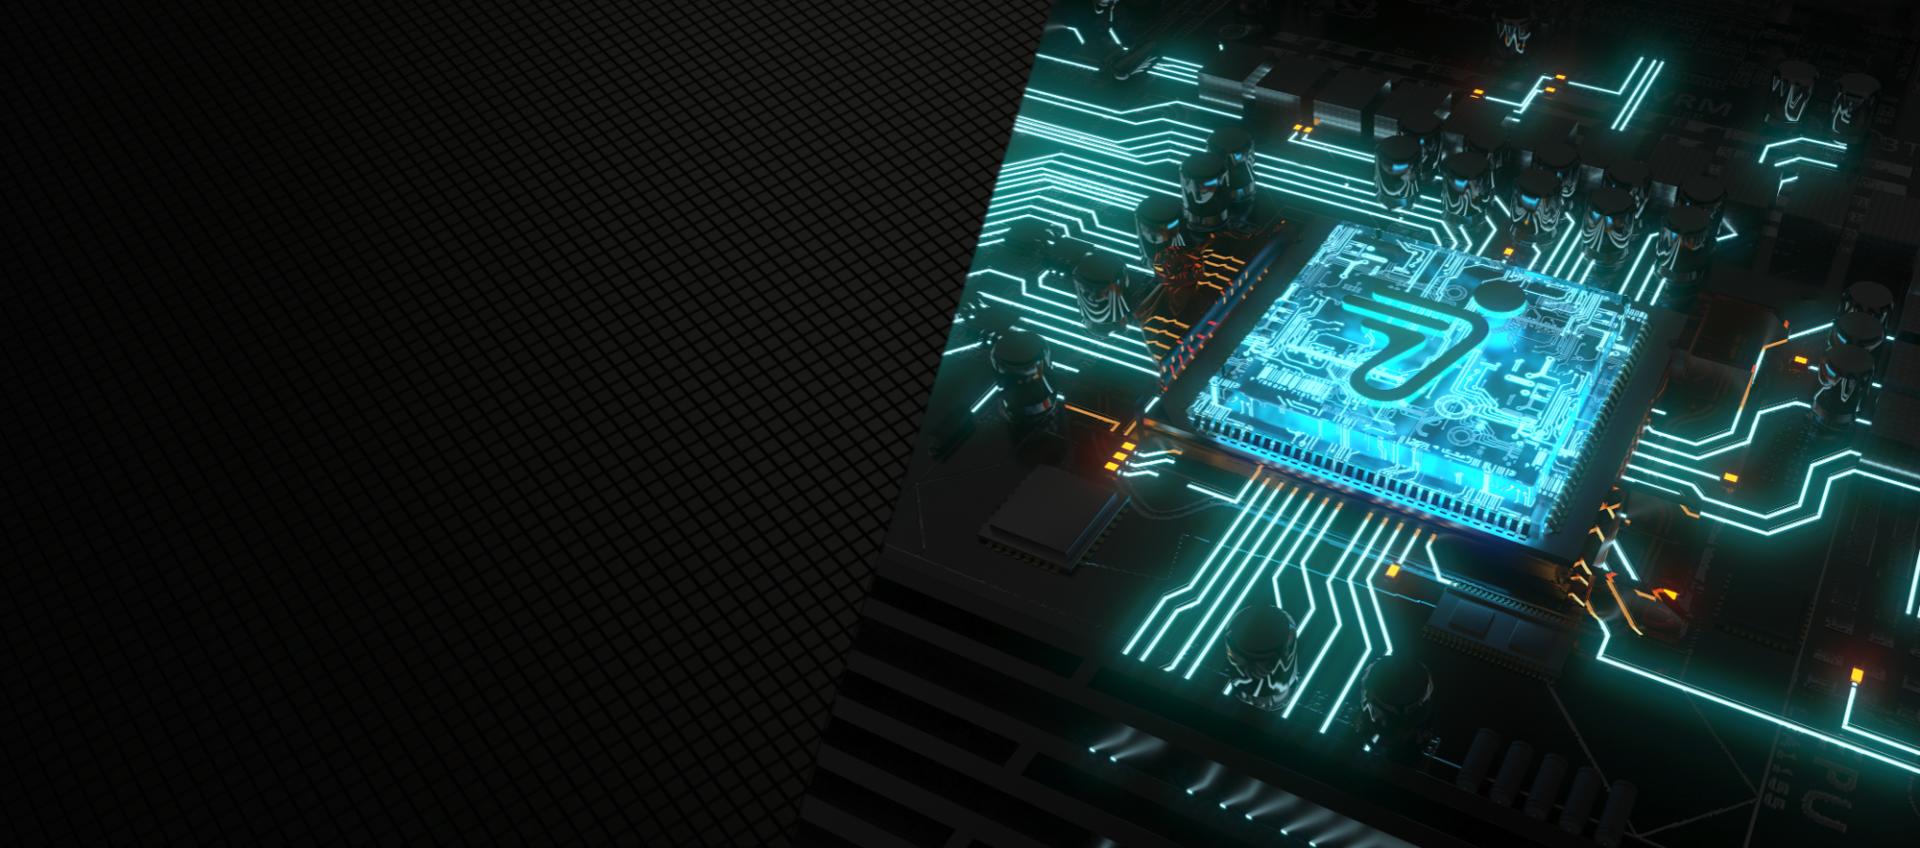 Profiteer van het Smart Battery Management System (BMS)